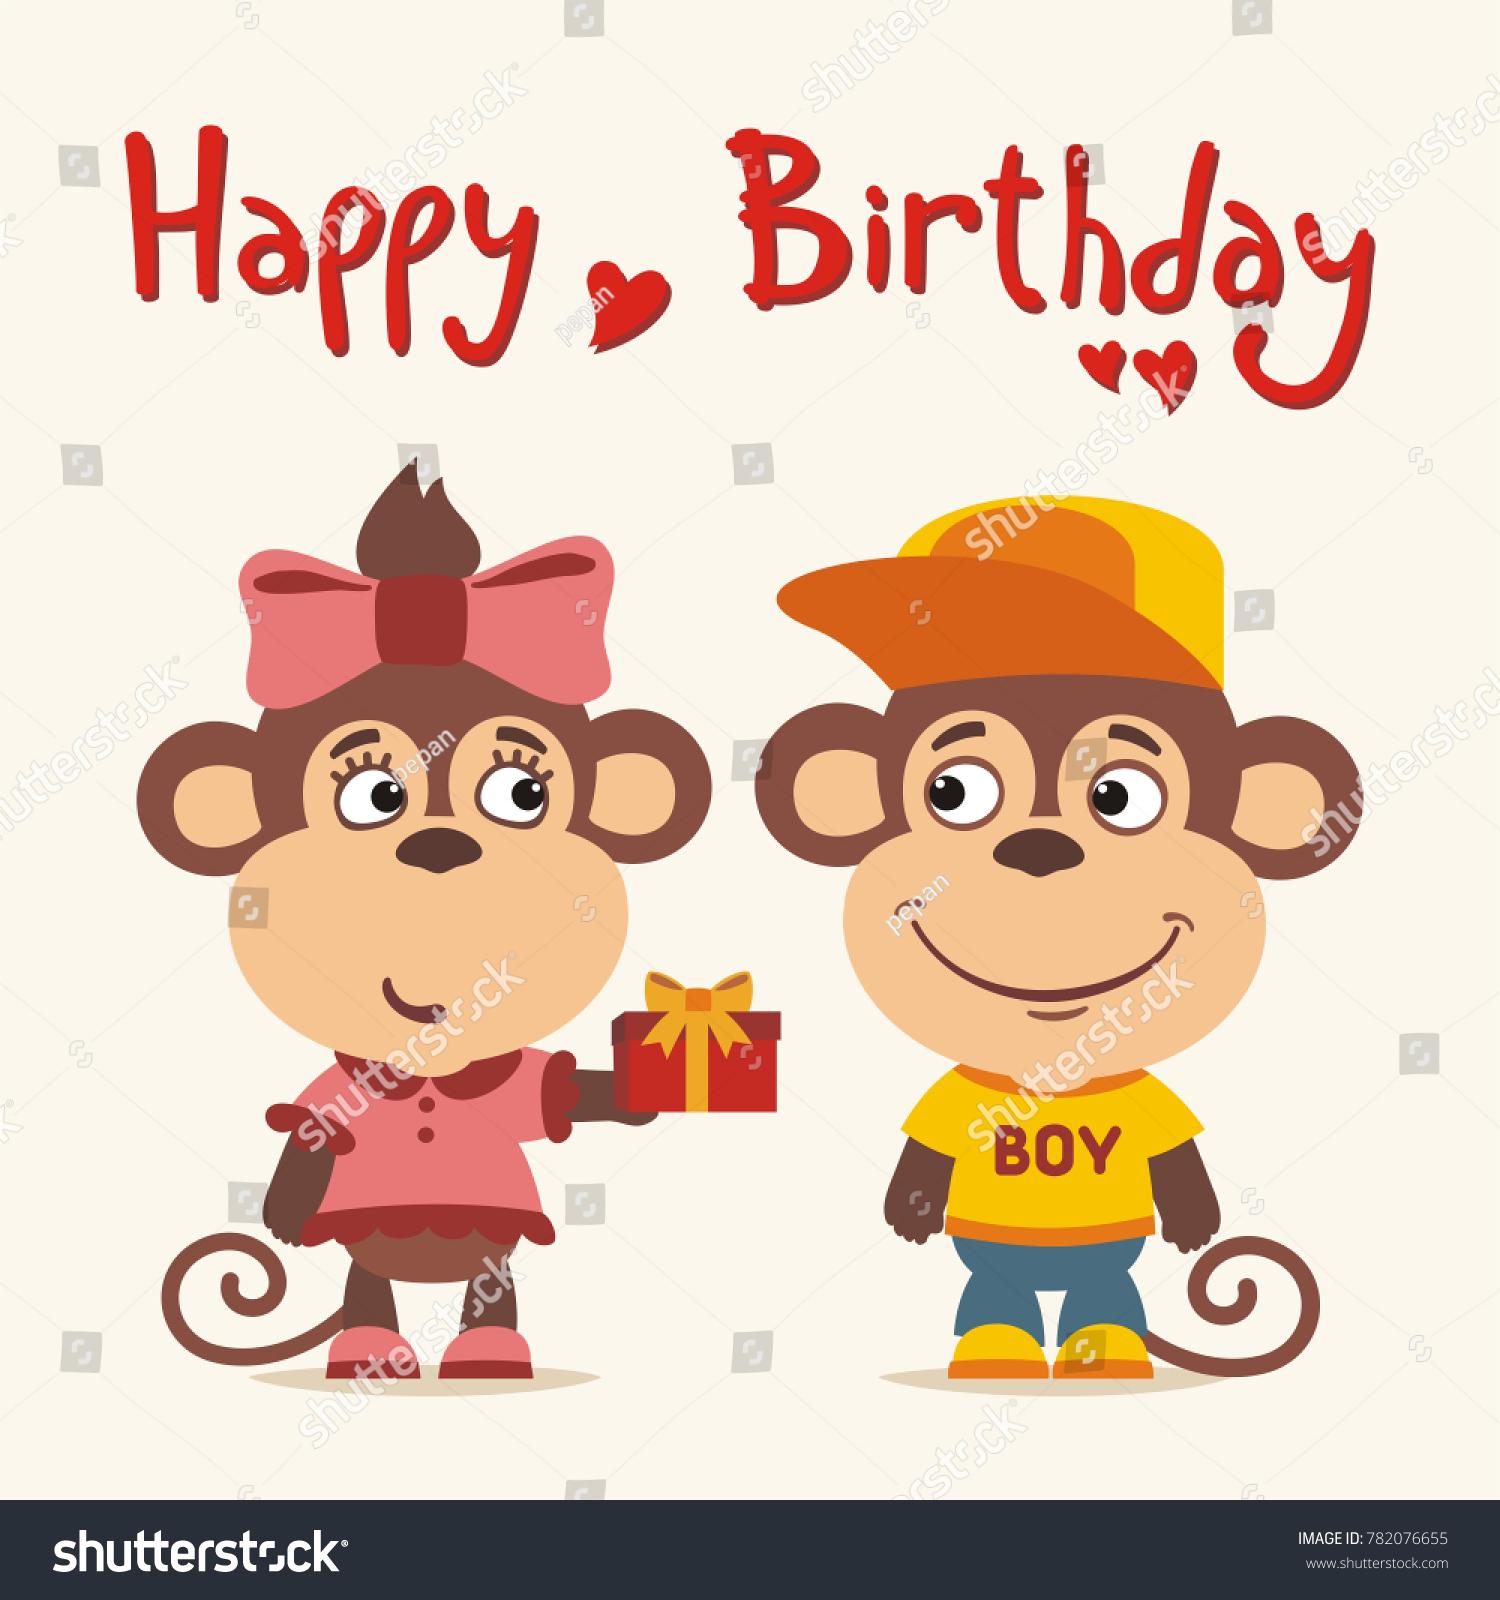 Happy birthday to you обезьяны открытка 86